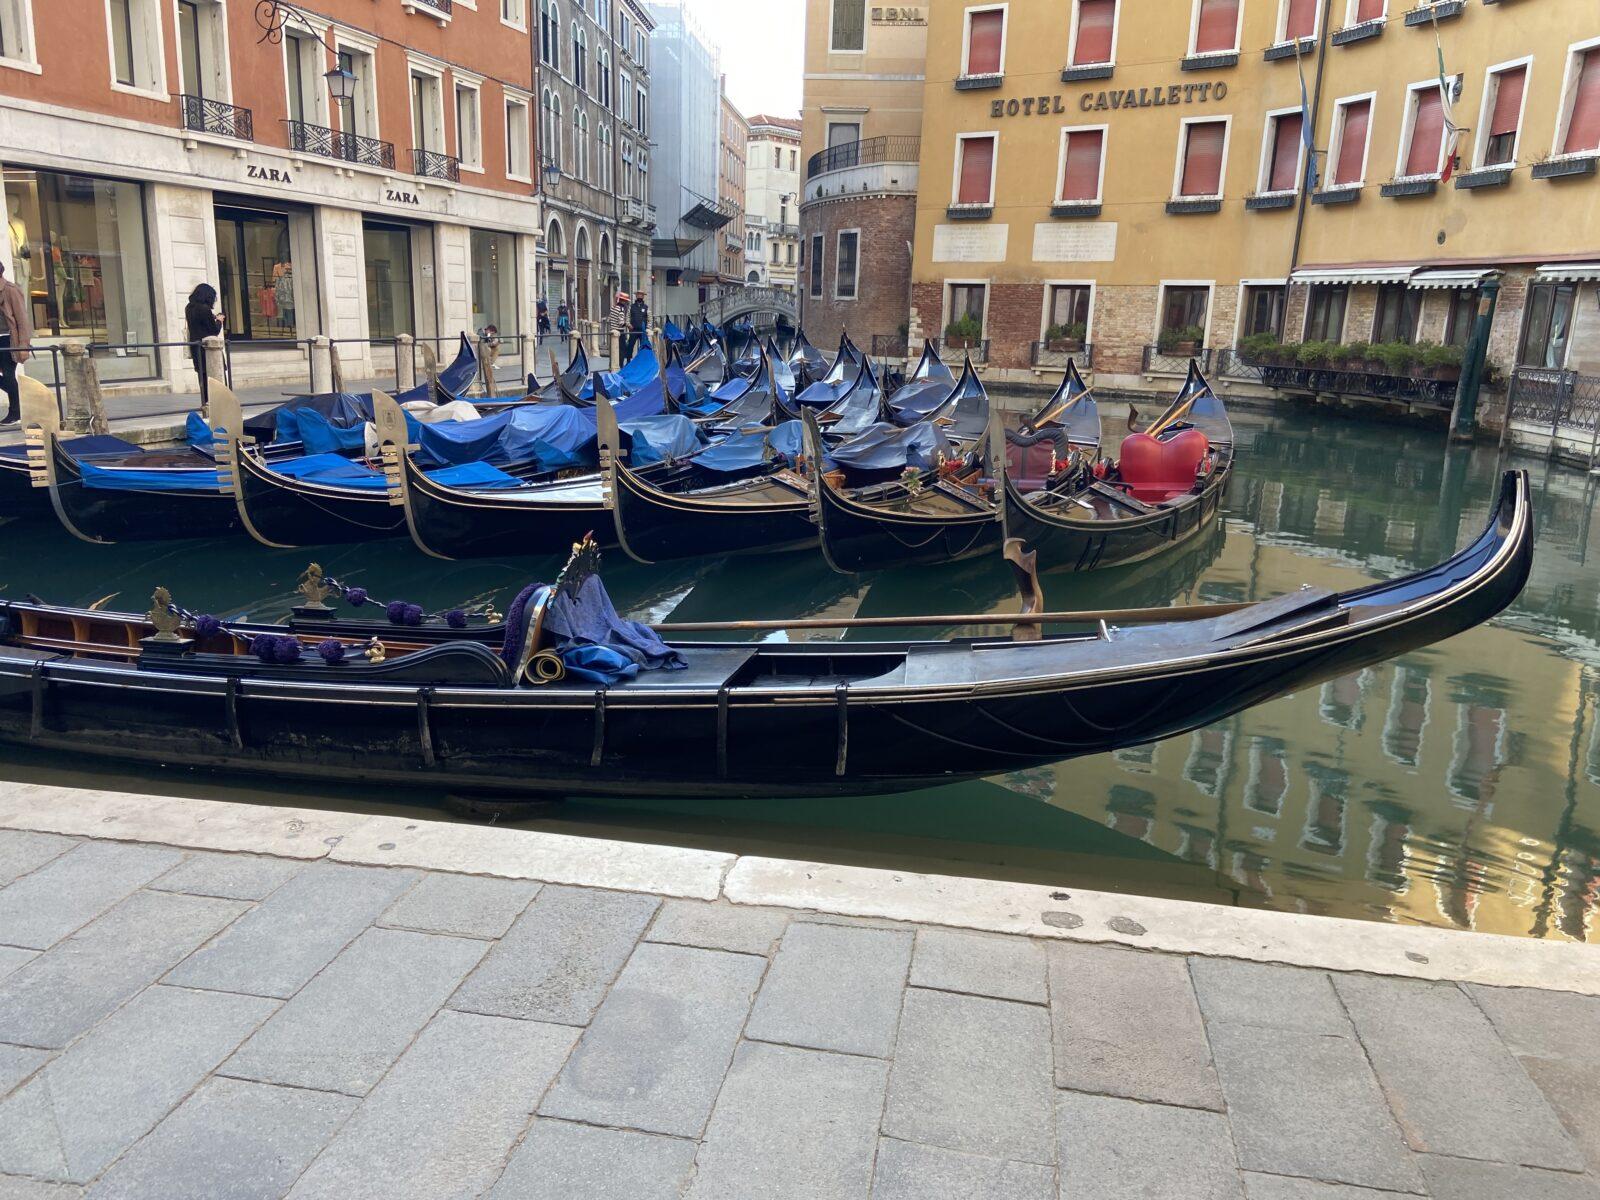 Venice has used gondolas since the 11th century.